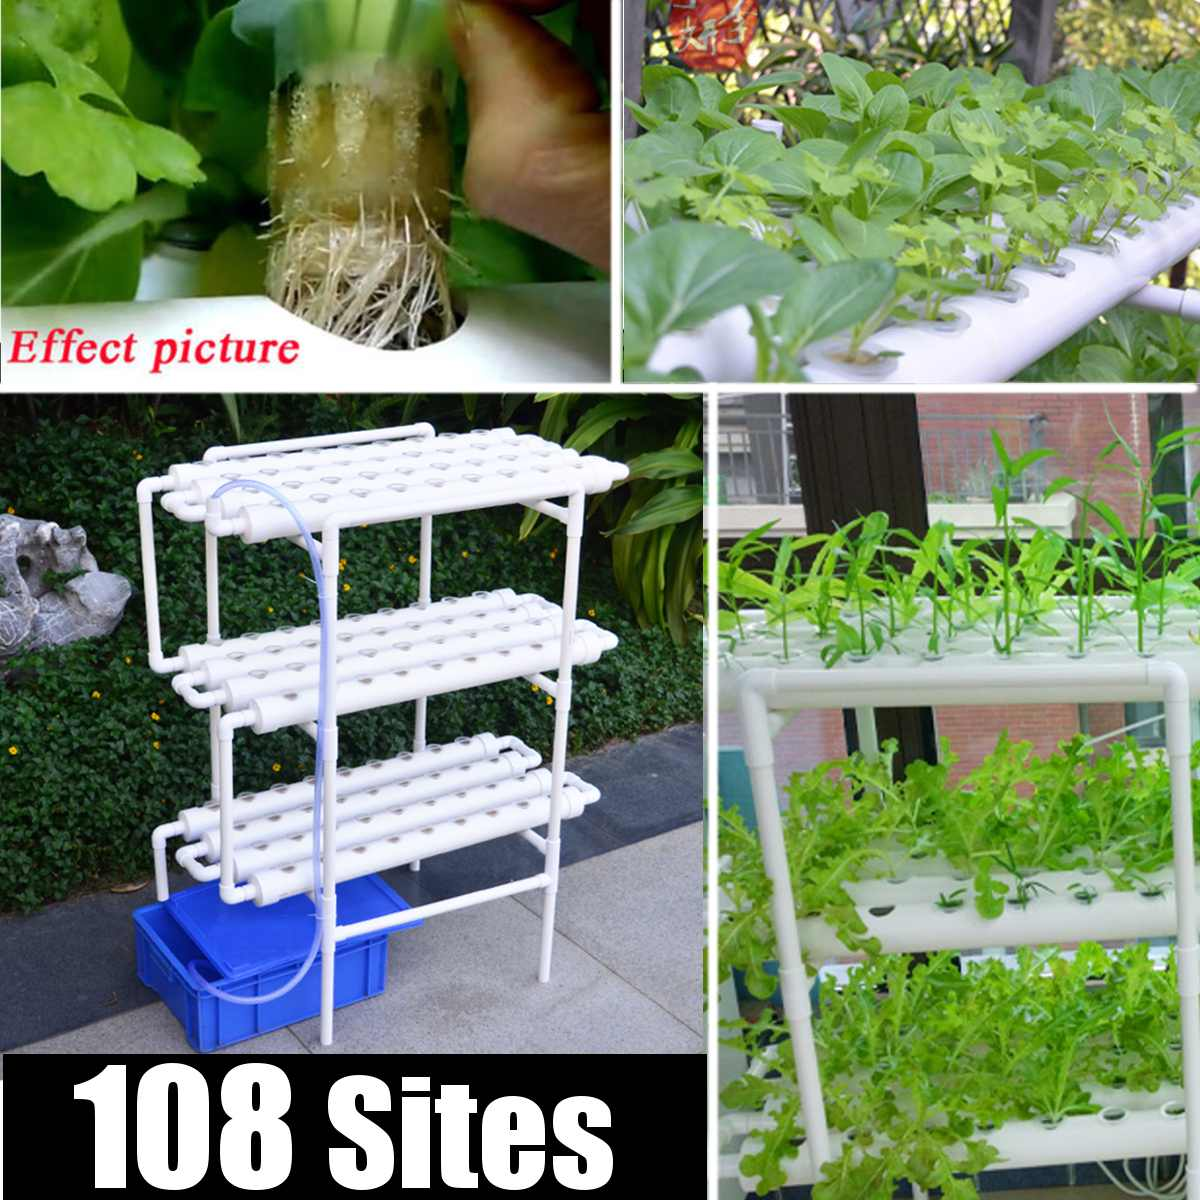 112pc/set 108 Hole Plant Hydroponic System Grow Kit Nursery Pots Anti Pest Soilless Cultivation Indoor Garden Culture Plant 220V